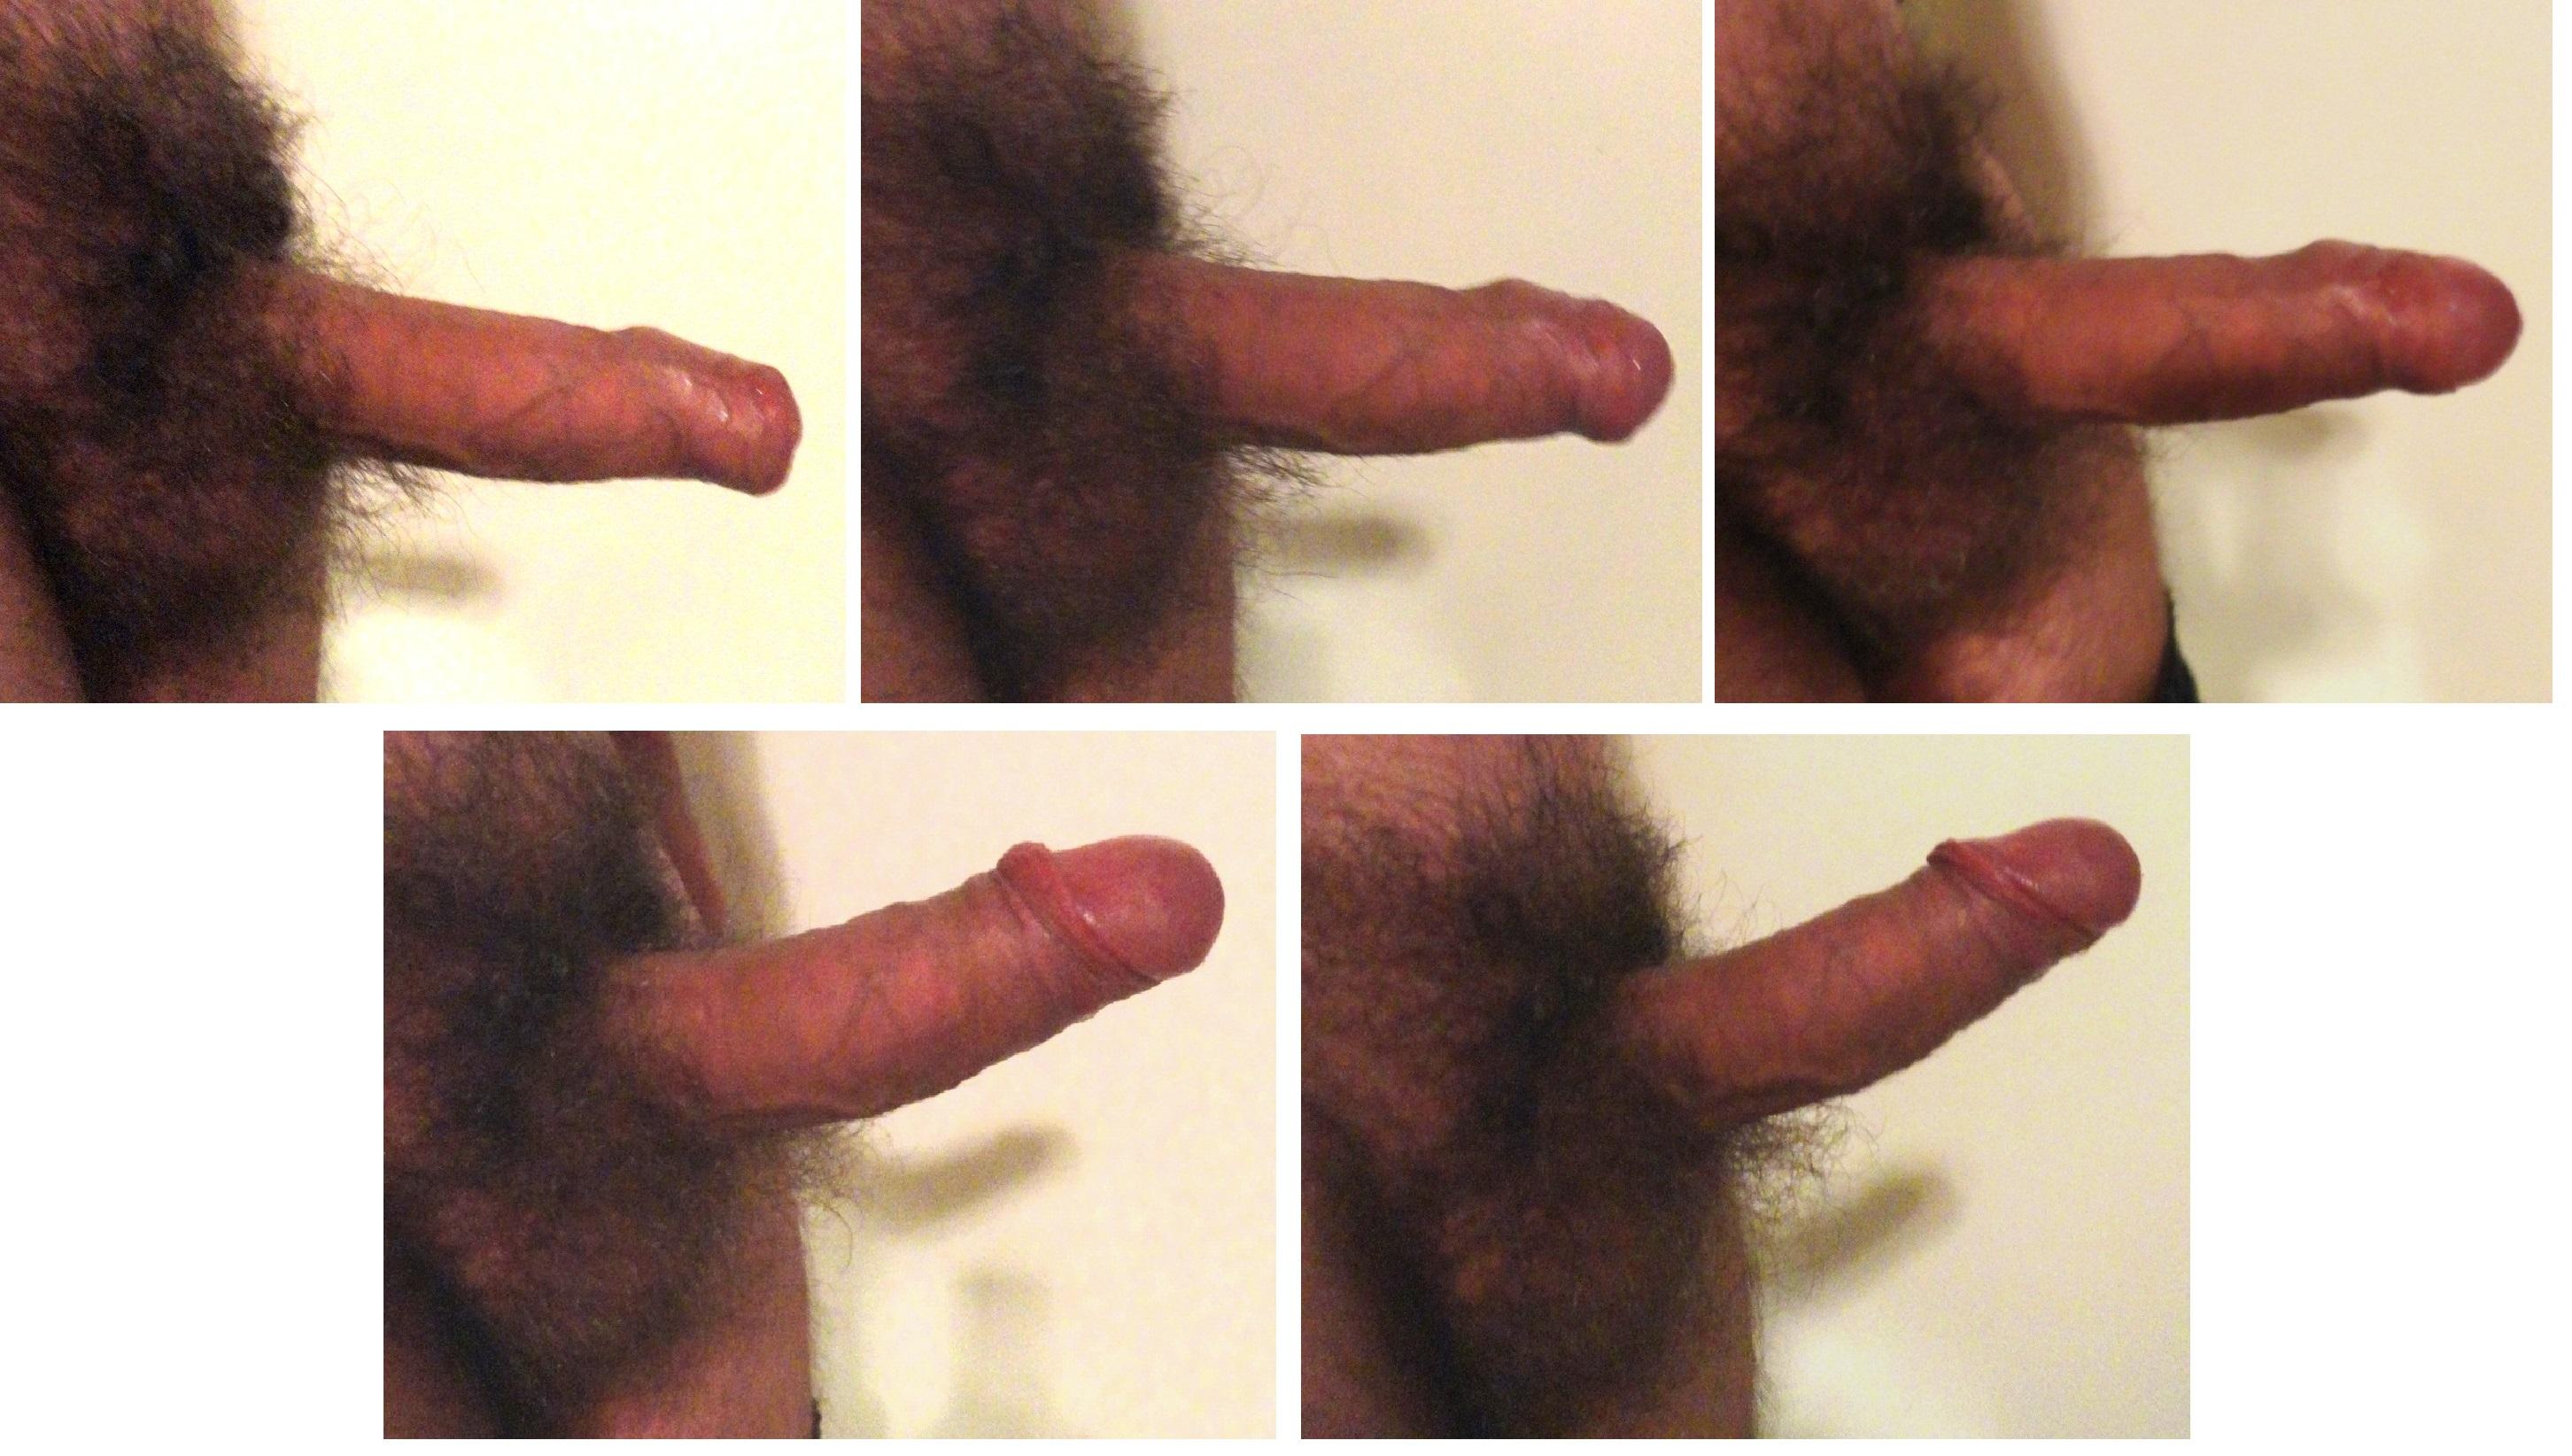 Penis erection study